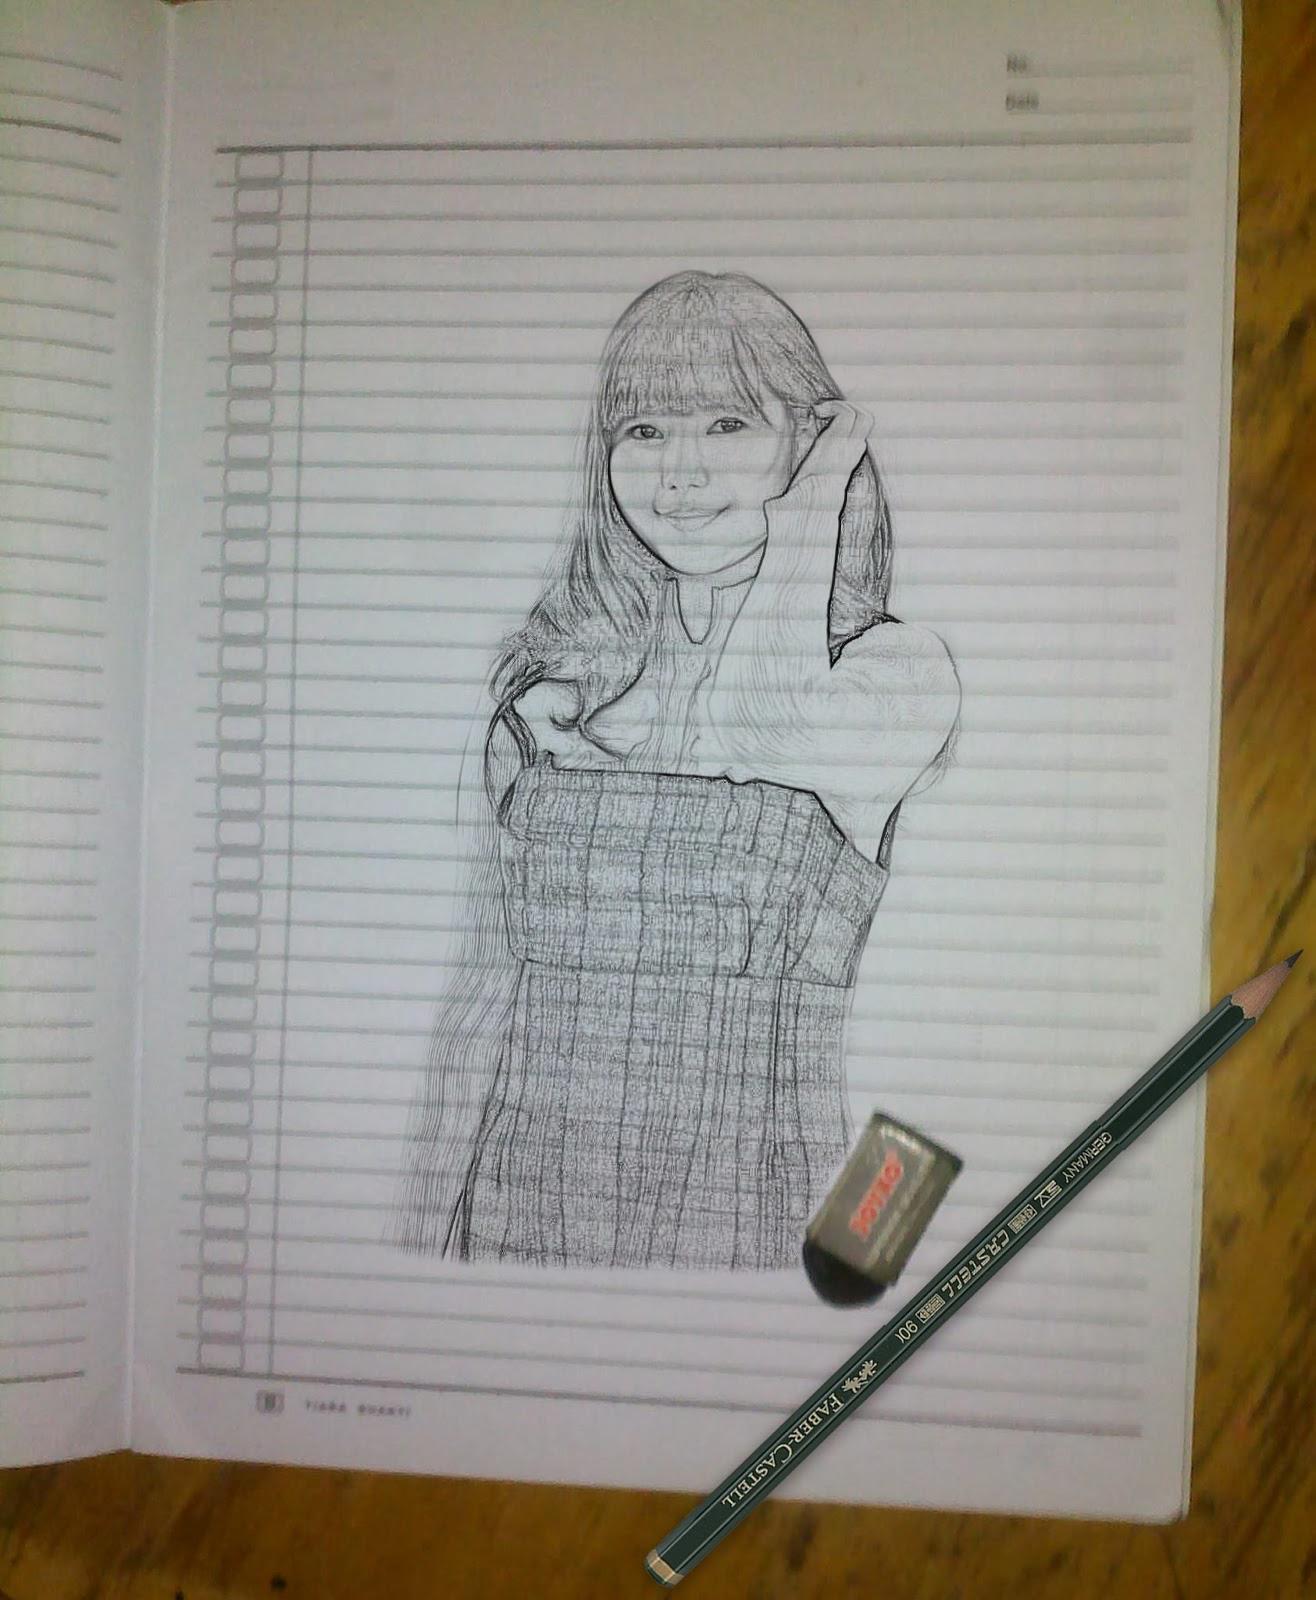 101+ Gambar Bagus Pakai Pensil Paling Keren